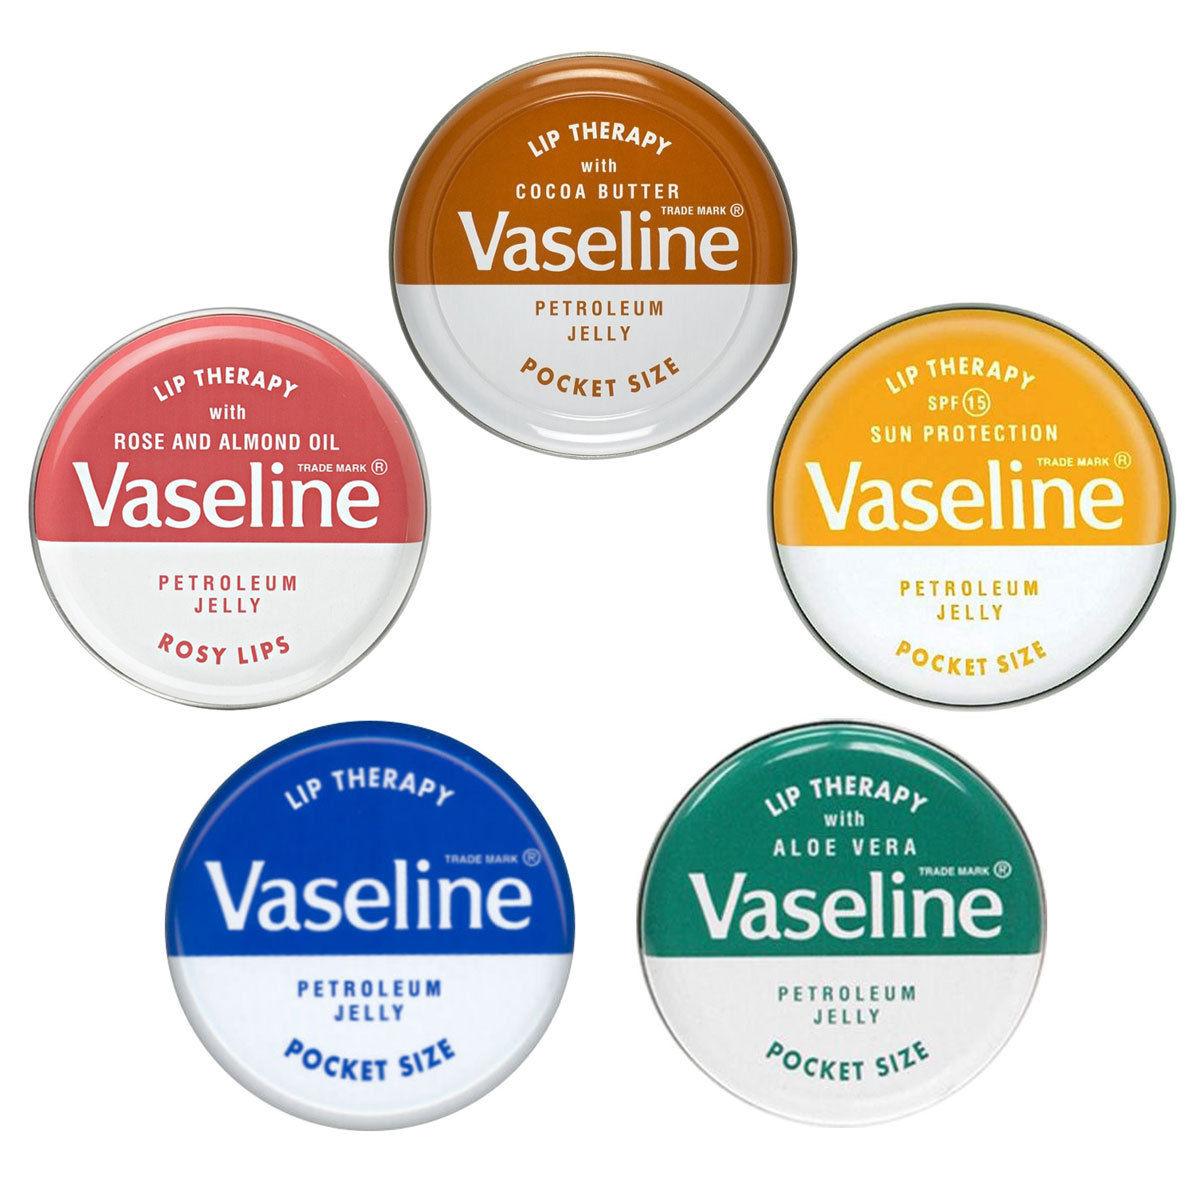 Vaseline Lip Therapy Petroleum Jelly Pocket Size ลิปบาล์มวาสลีนตลับเหล็ก